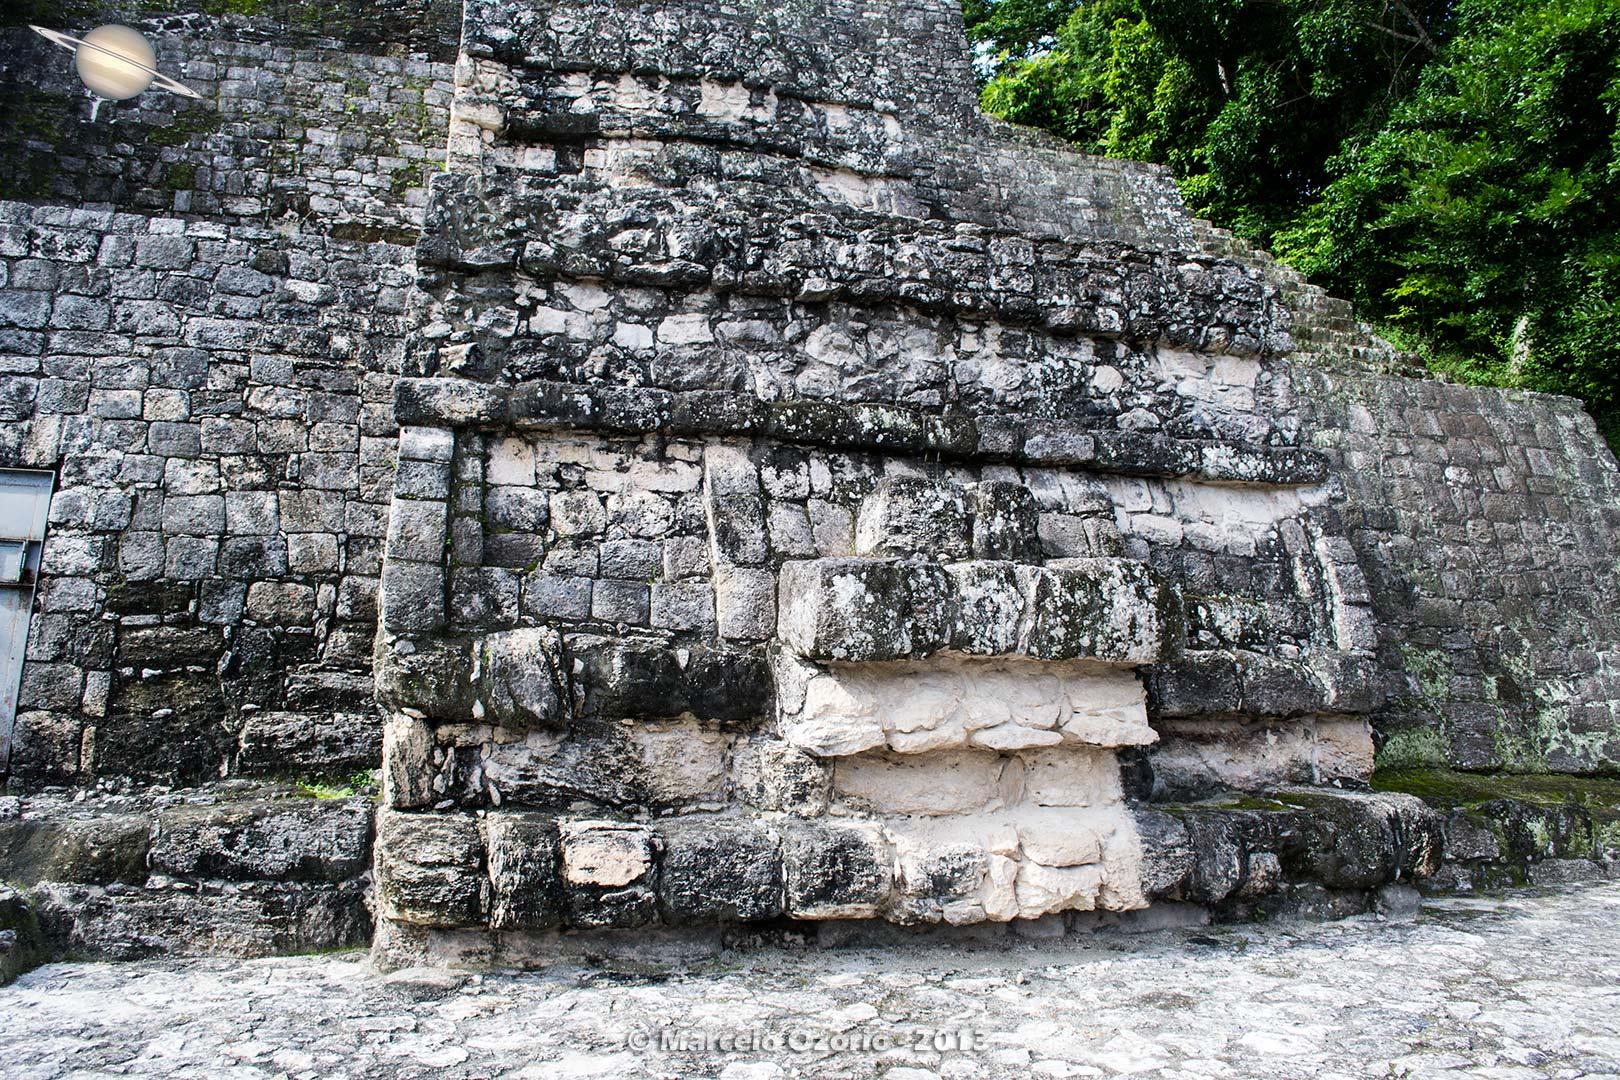 calakmul mayan civilization mexico 7 - Calakmul, City of the Two Adjacent Pyramids - Mexico